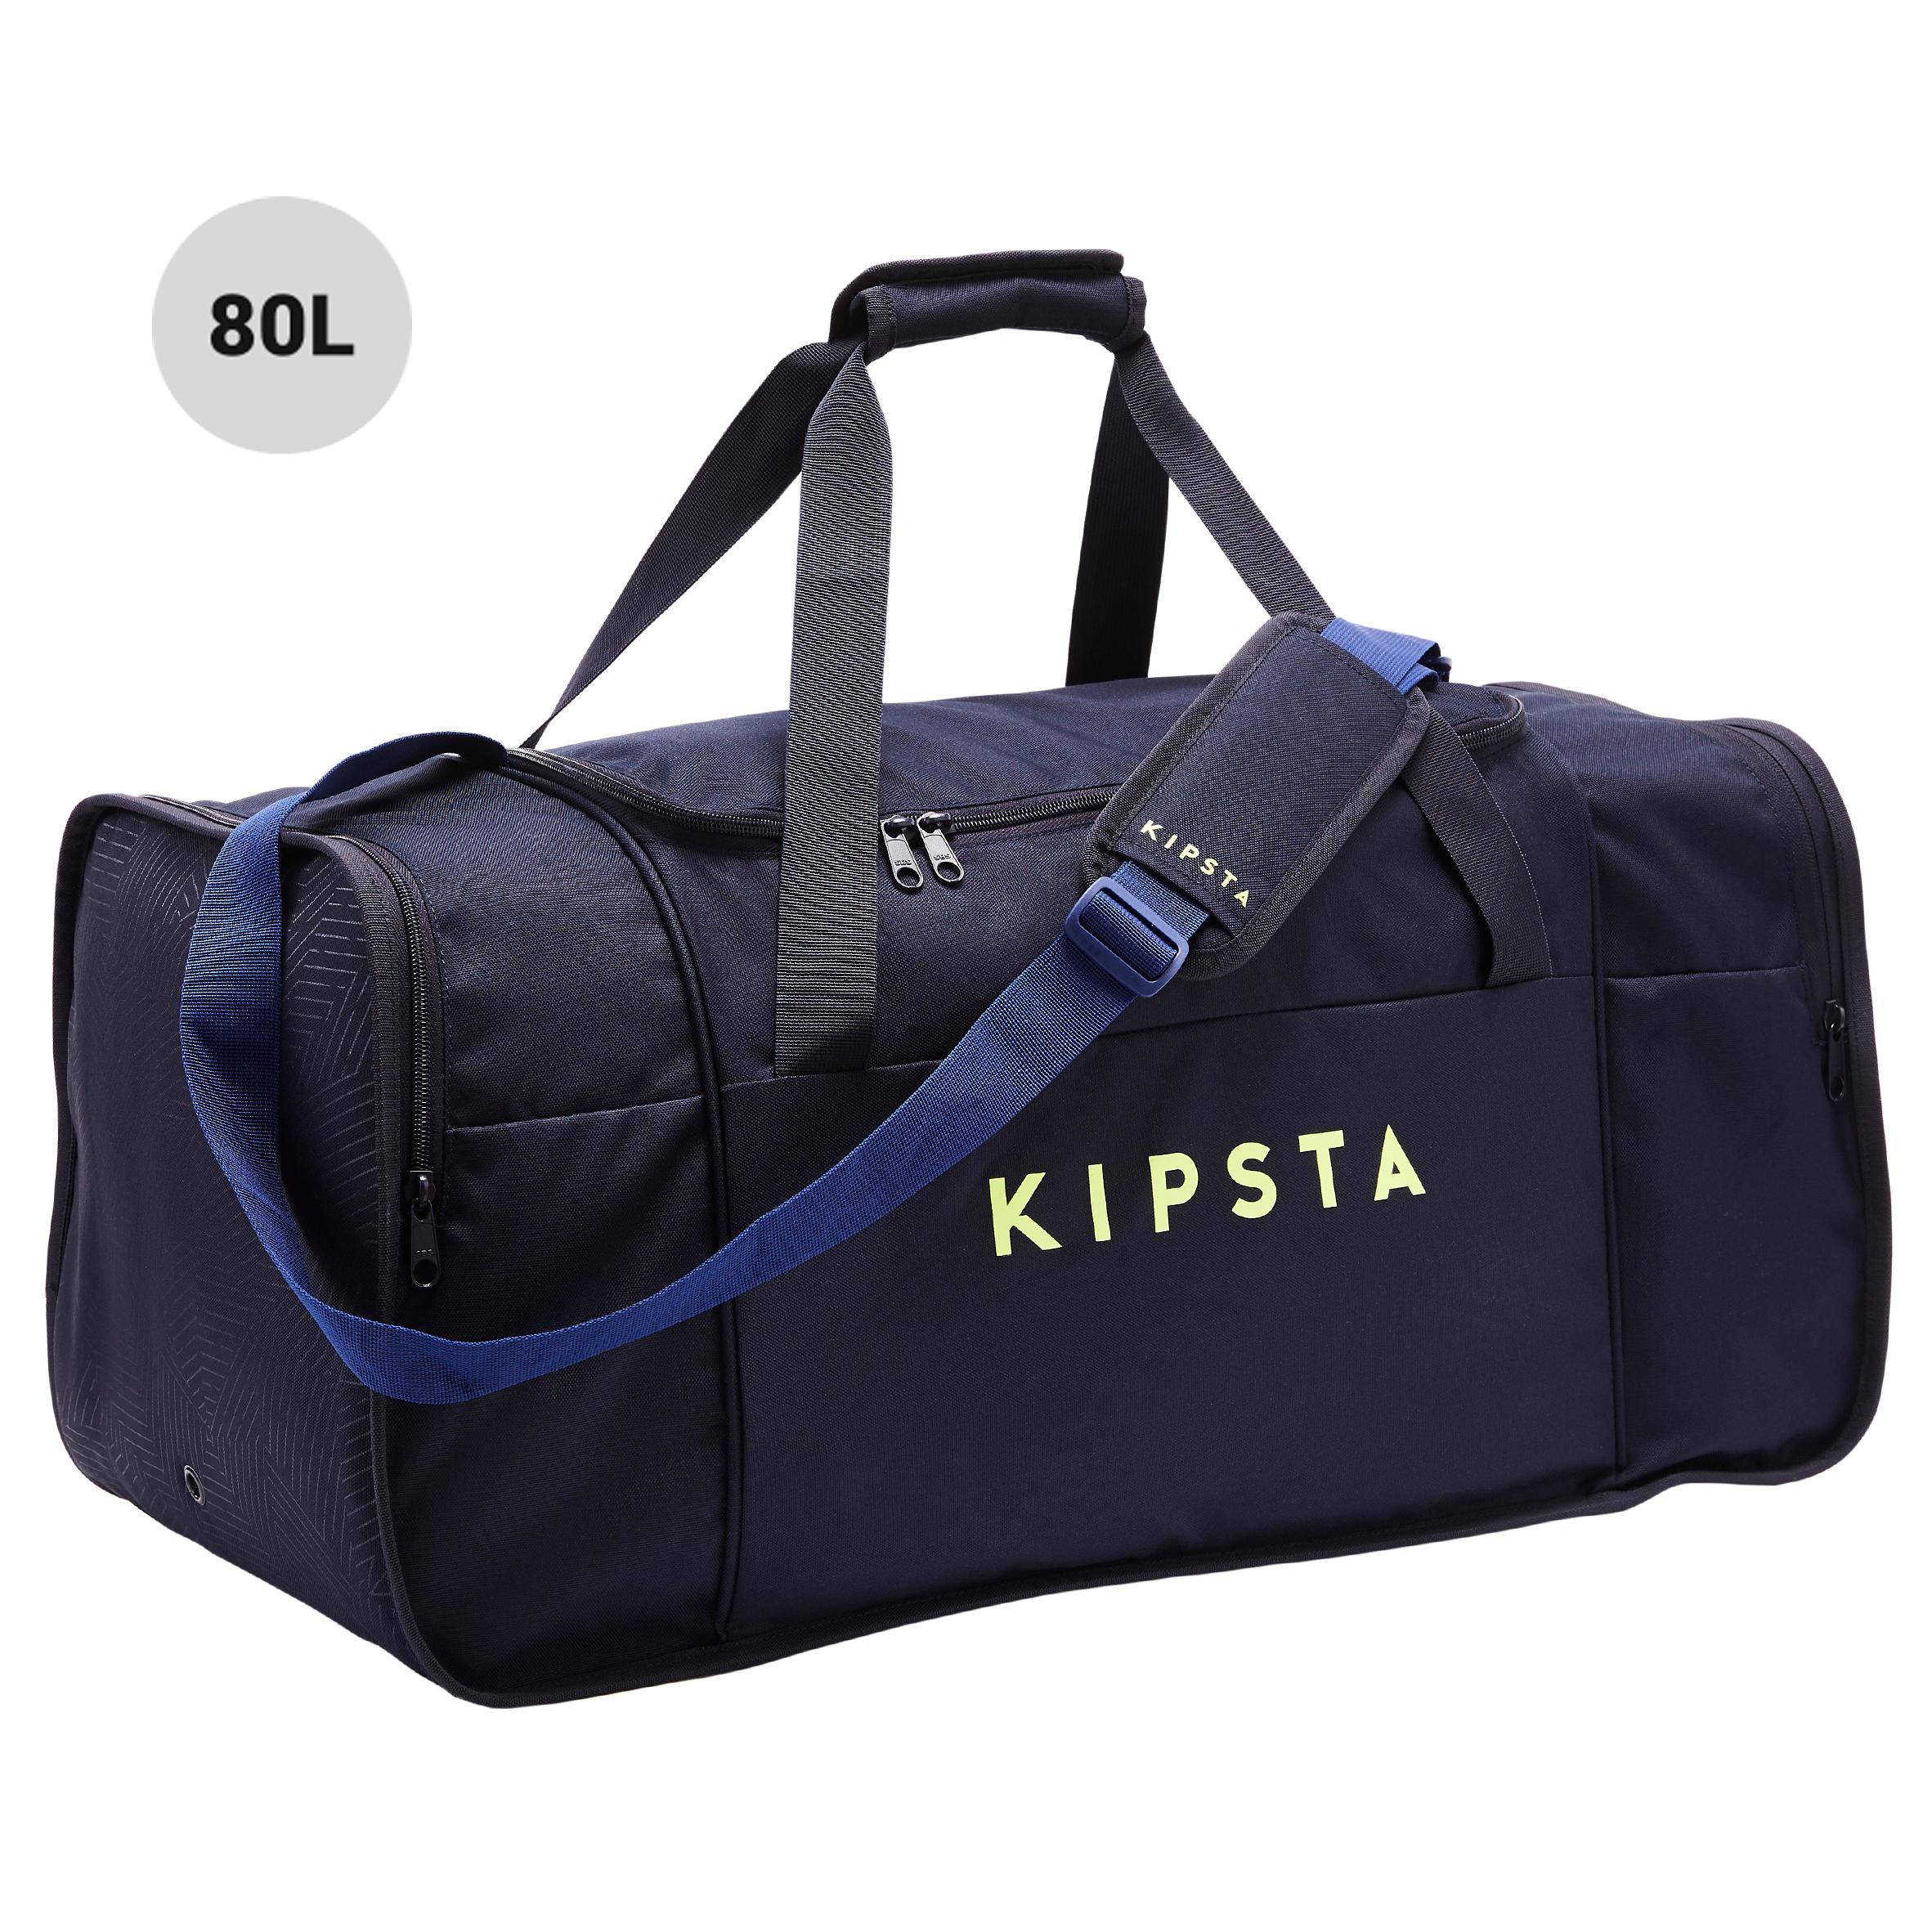 Maleta deportiva Kipocket 80 litros azul y amarilla